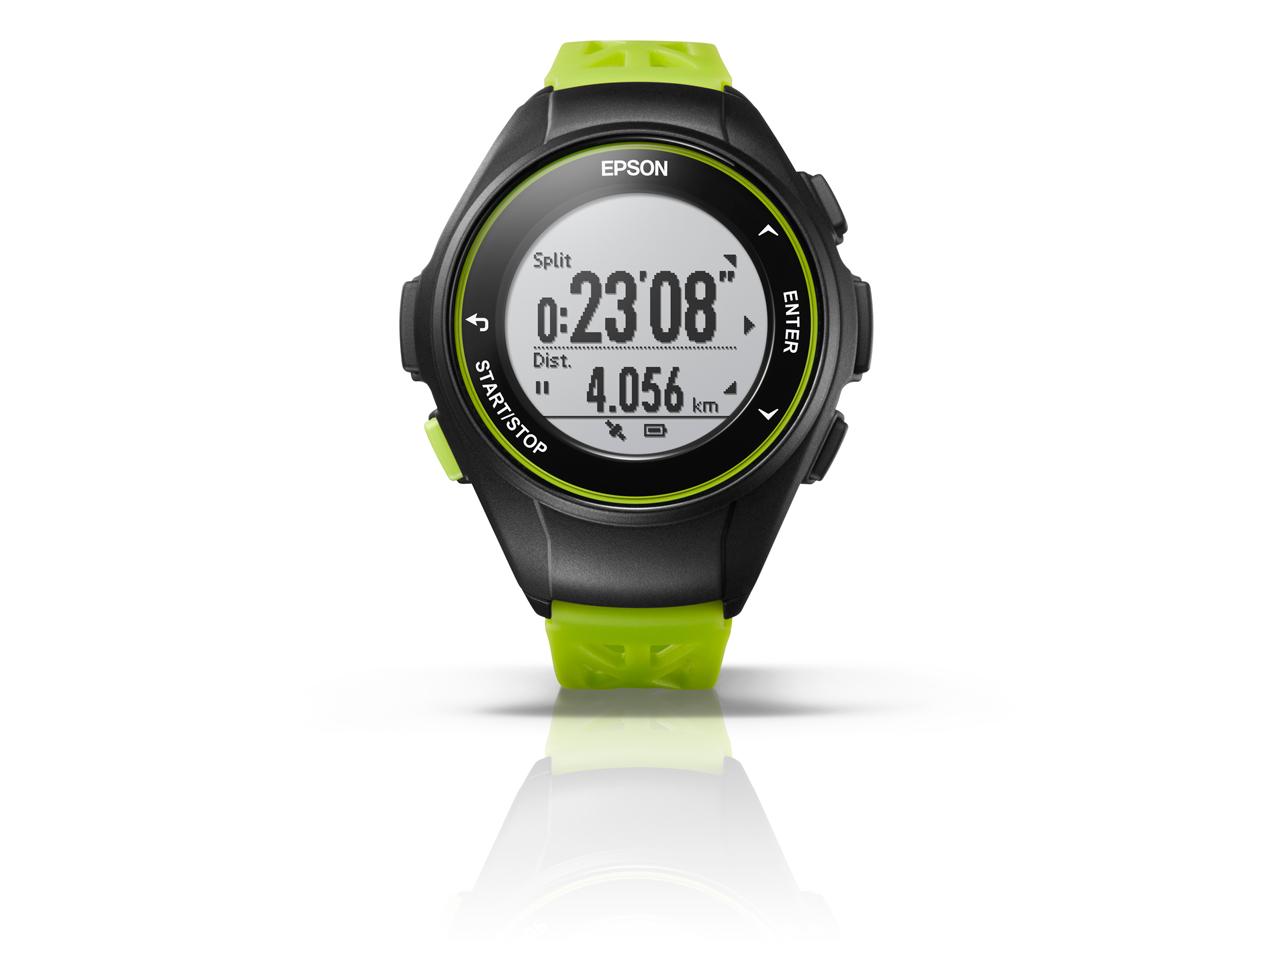 EPSON ランニングウオッチ WristableGPS Q-10G 【グリーン】 【腕時計】【送料無料】